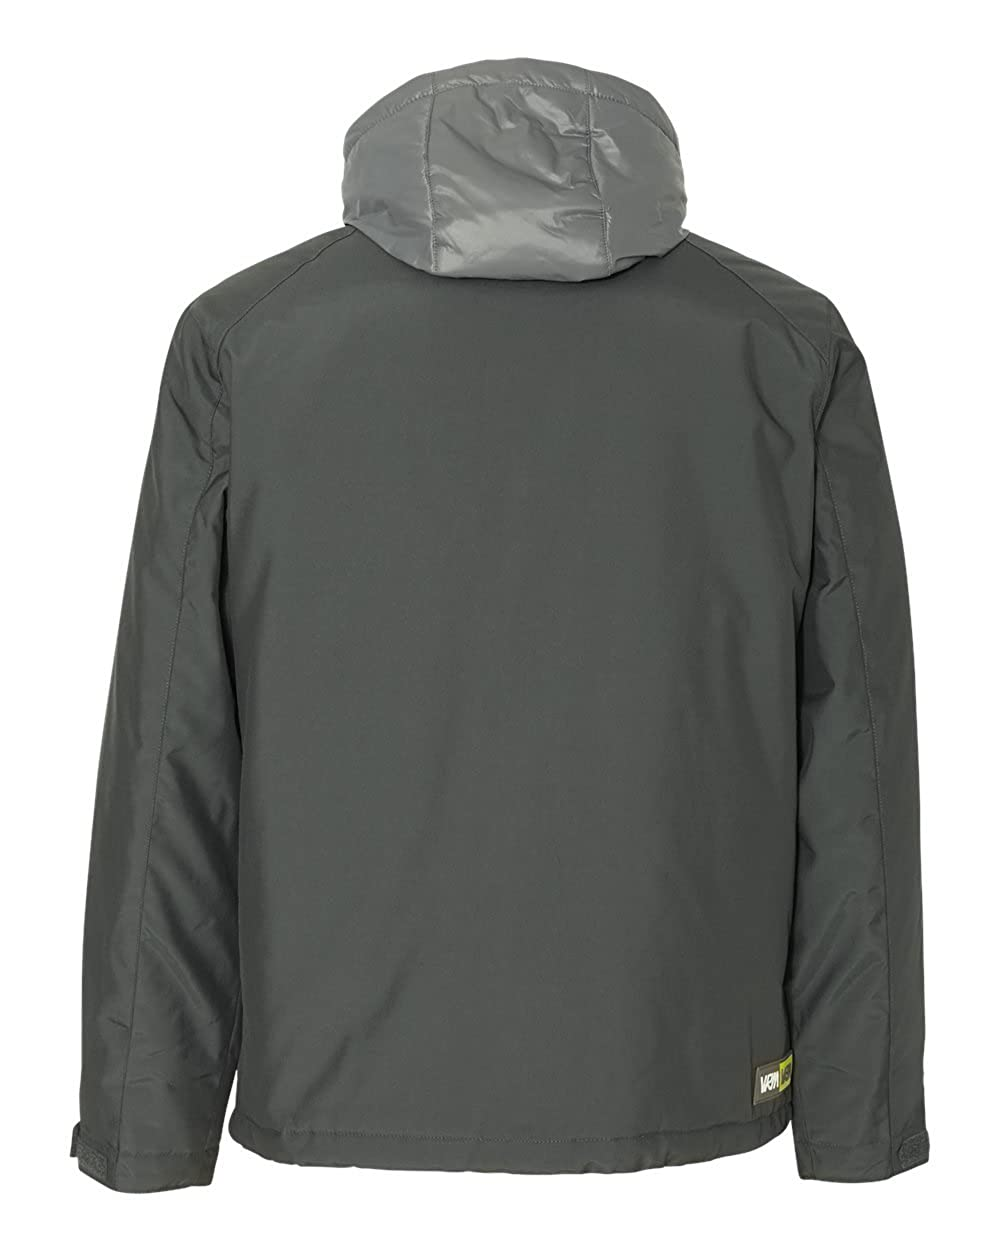 Weatherproof 17603 32 Degrees VRY WRM Turbo Jacket